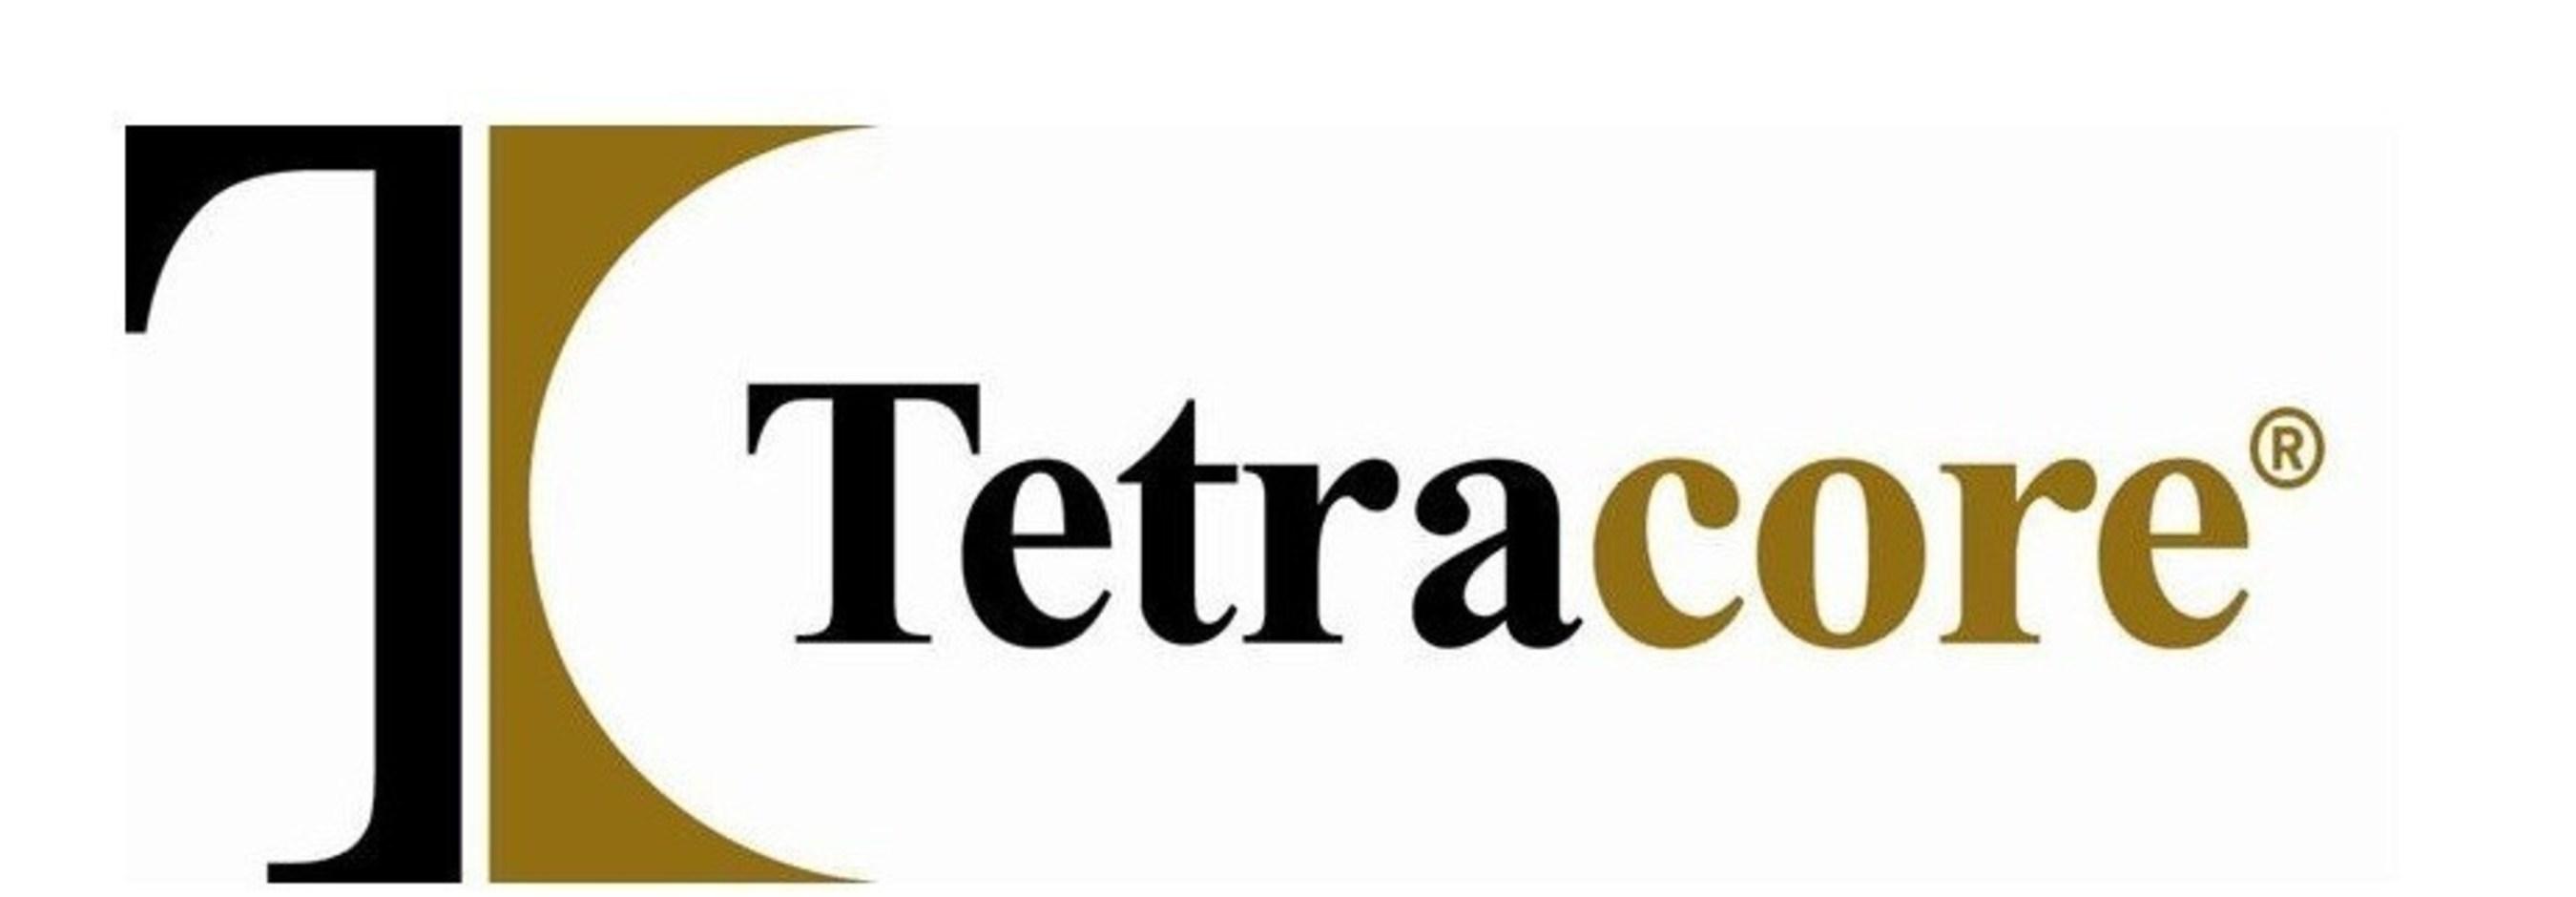 Tetracore